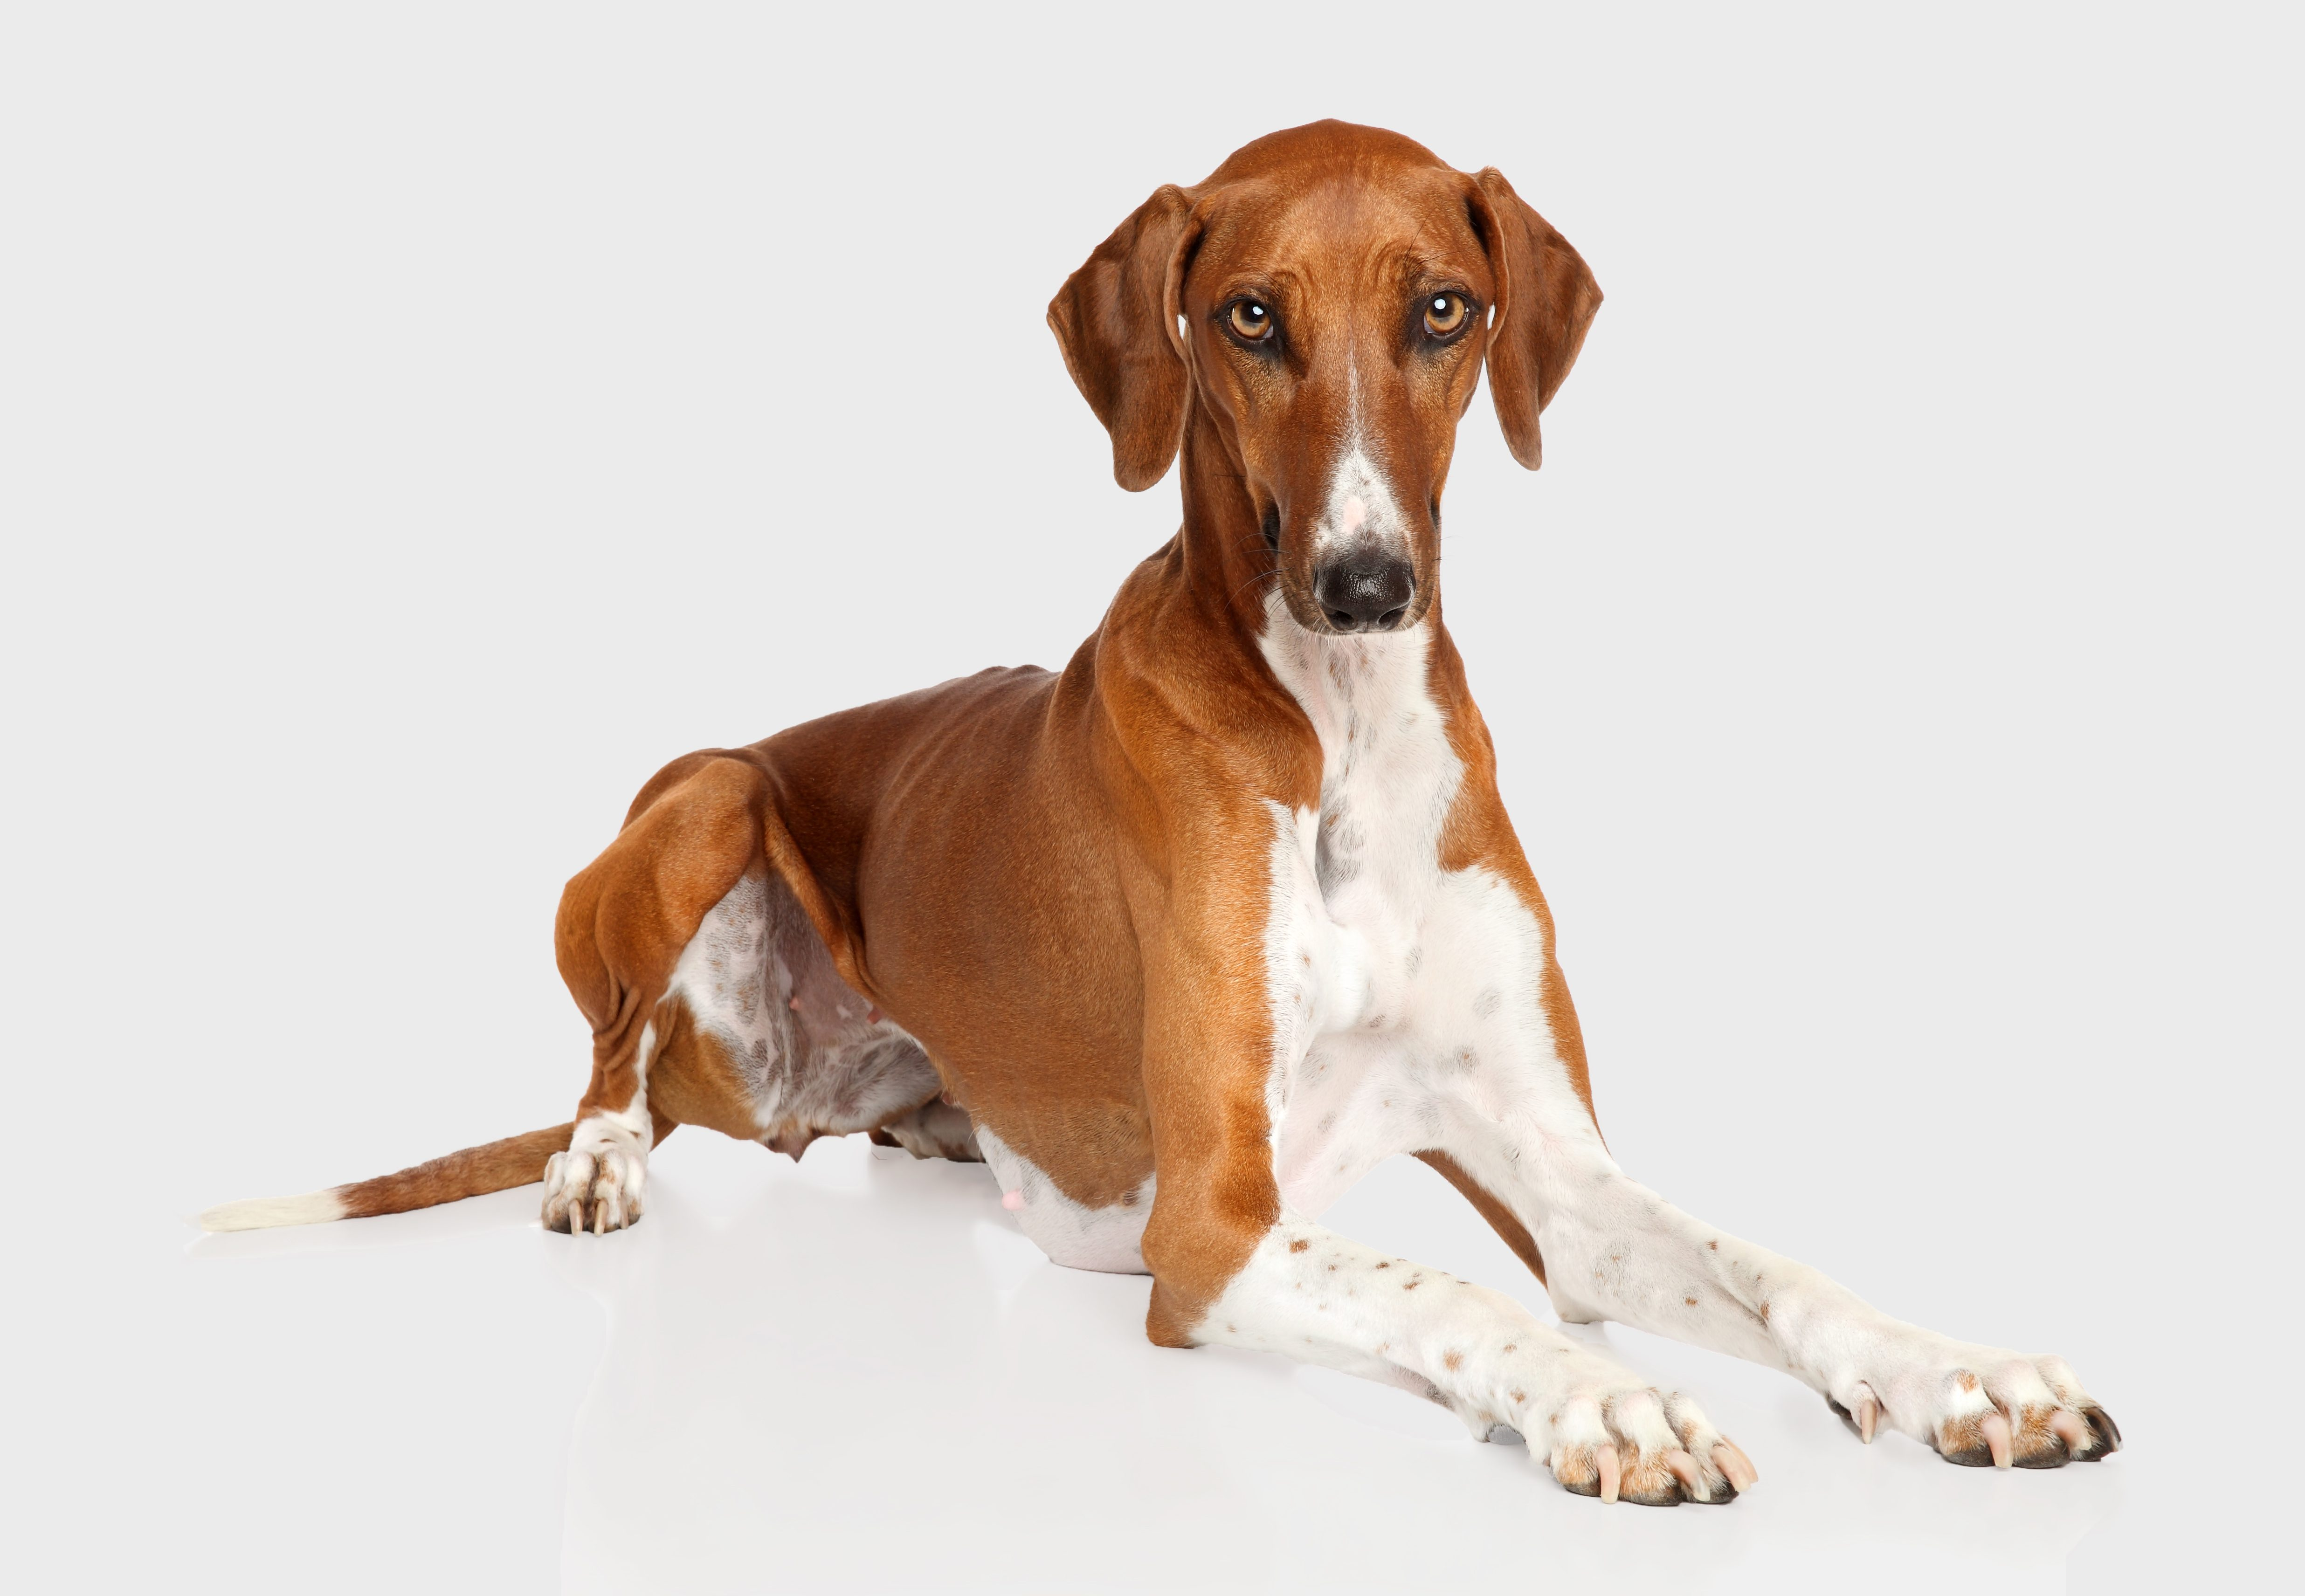 Azawakh dog breed